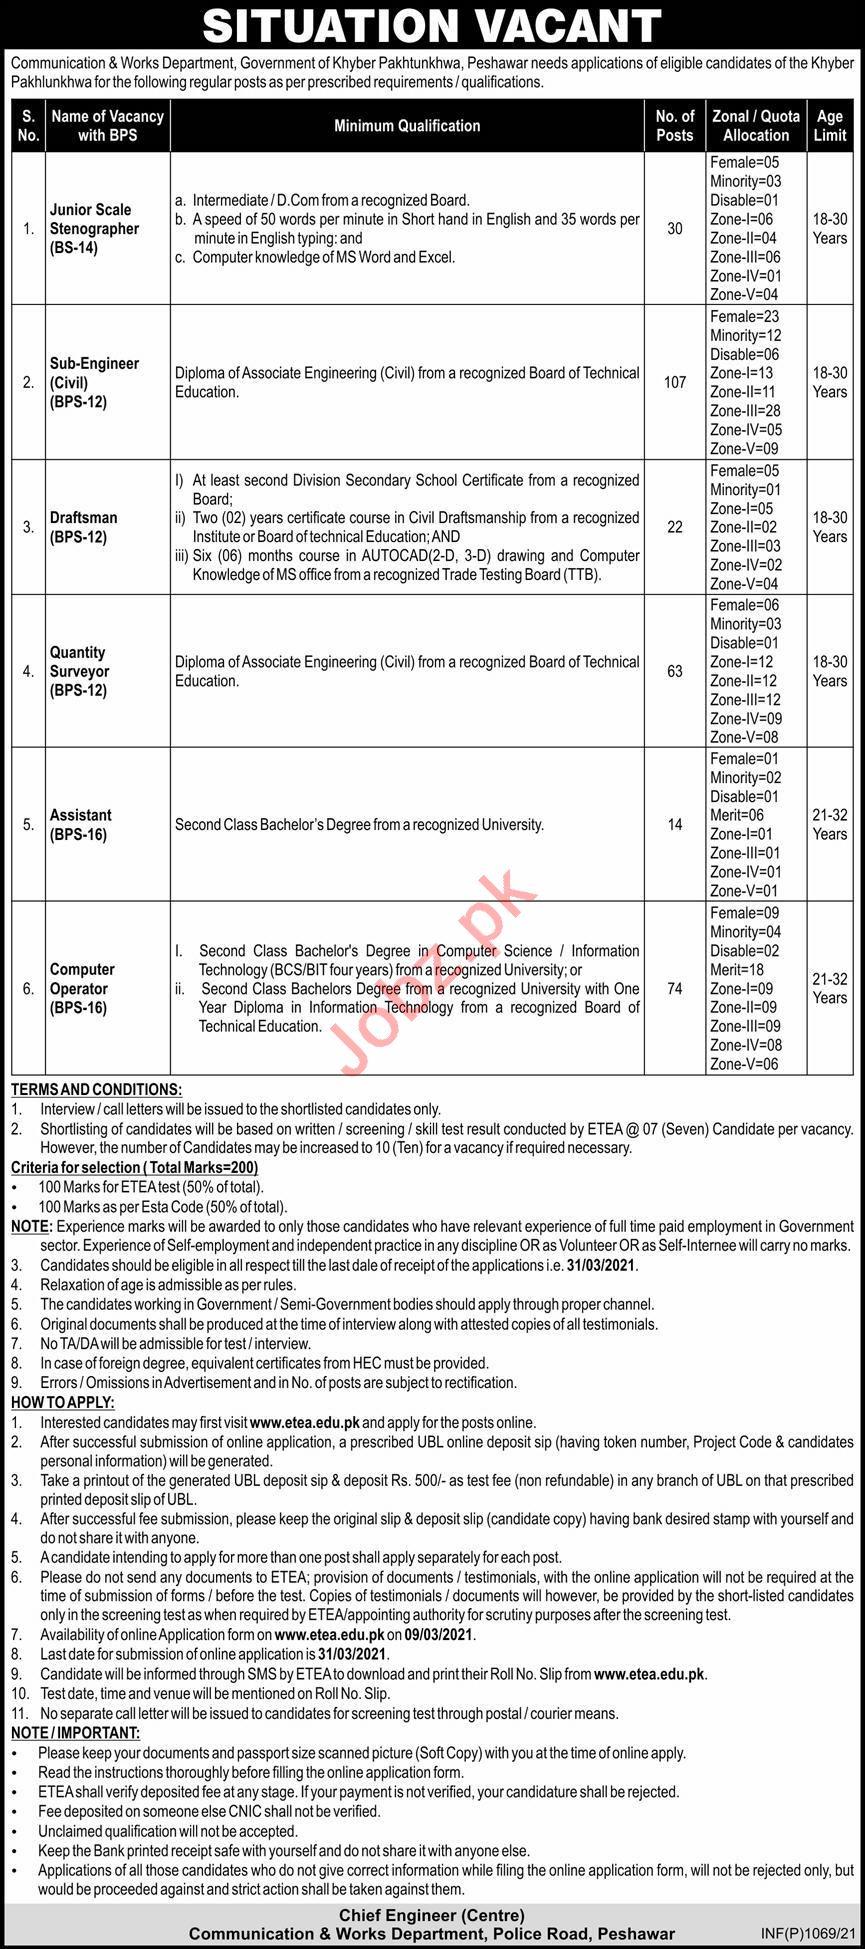 Communication & Works Department Peshawar Jobs 2021